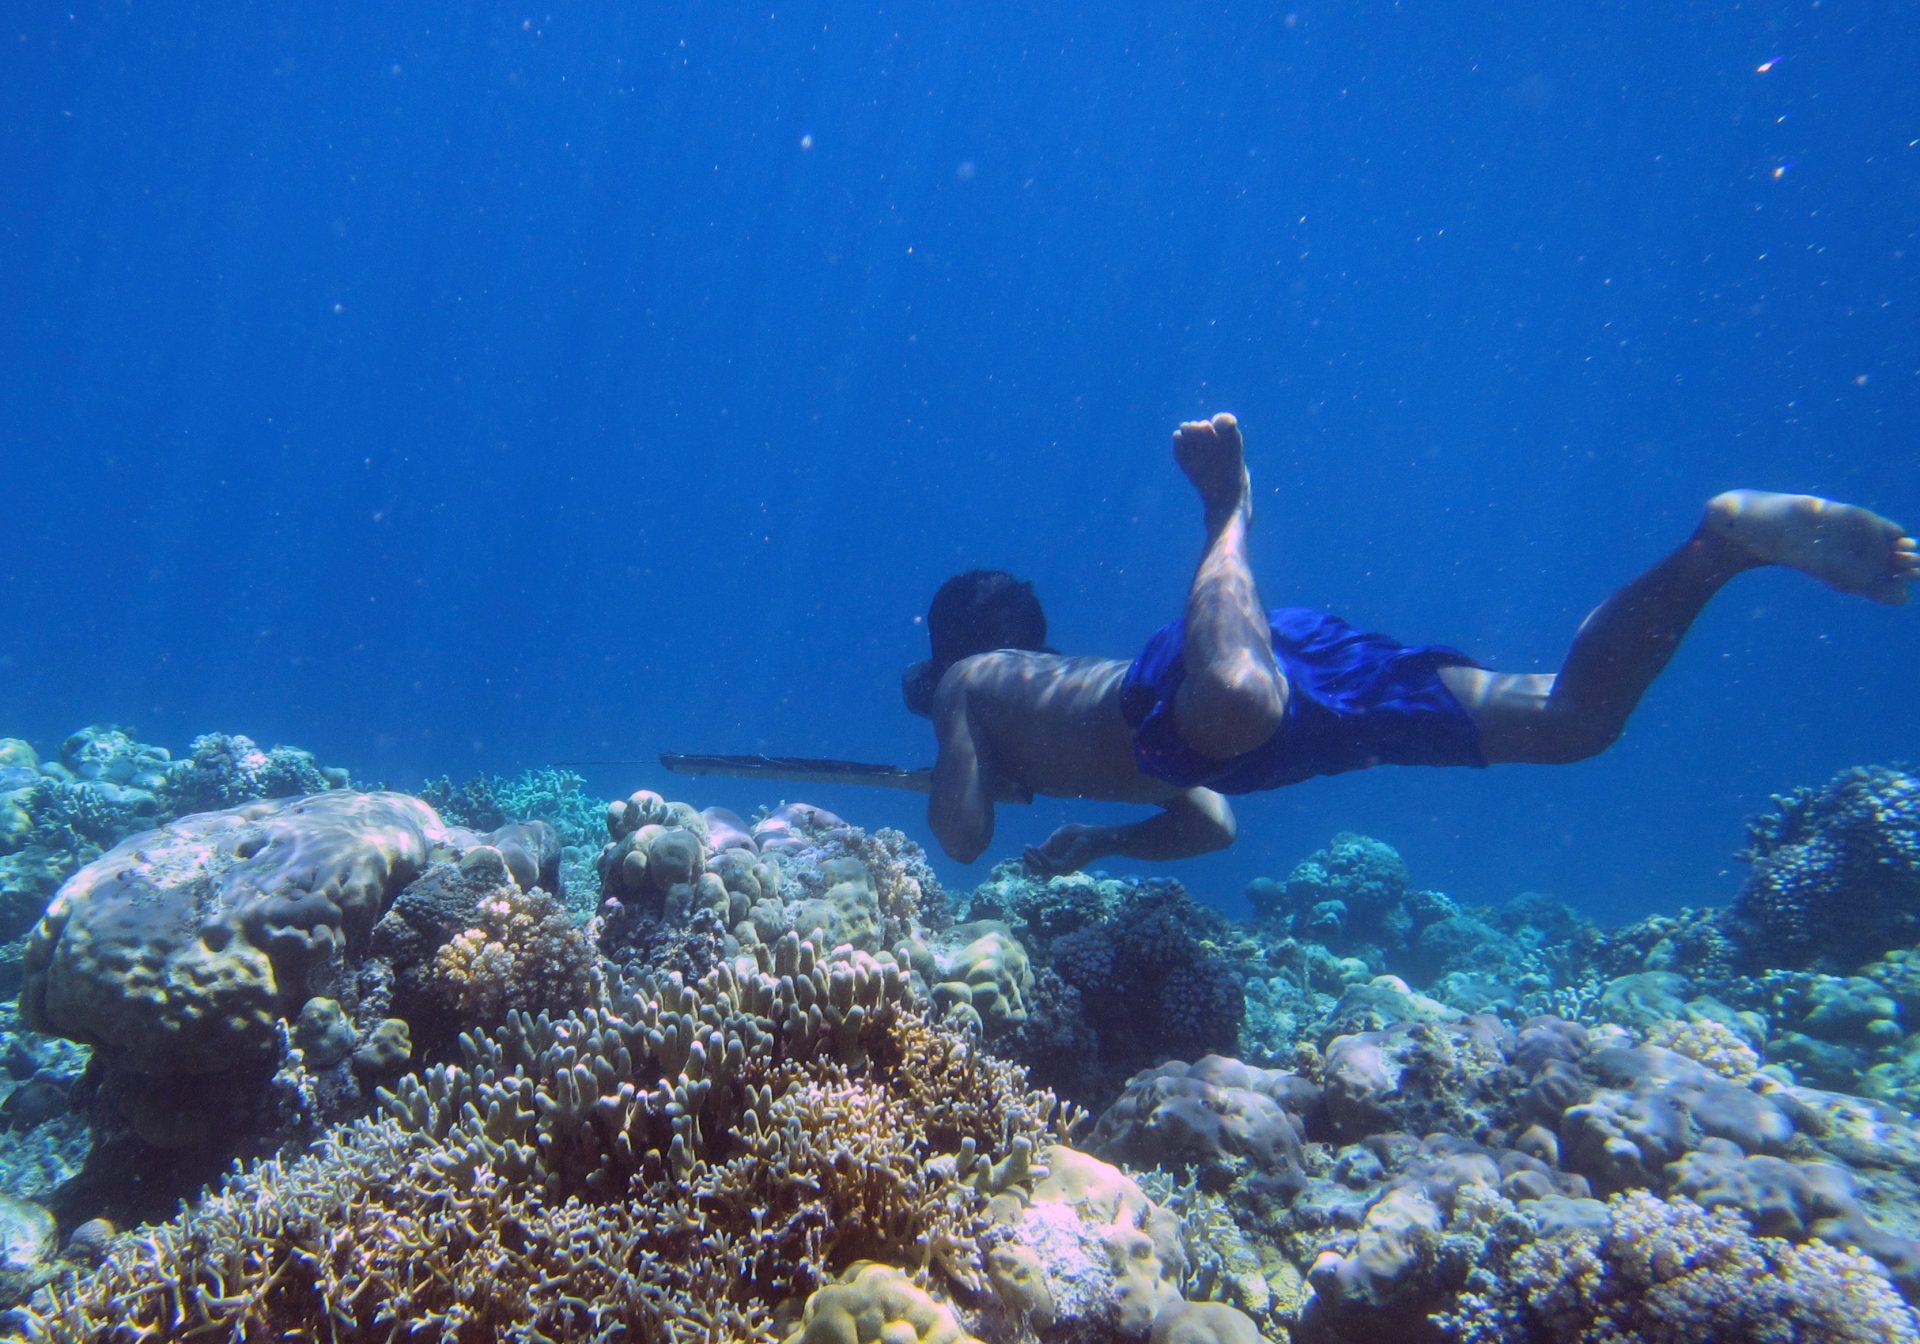 A Bajau diver hunts fish underwater using a traditional spear. (Photo by Melissa Ilardo)